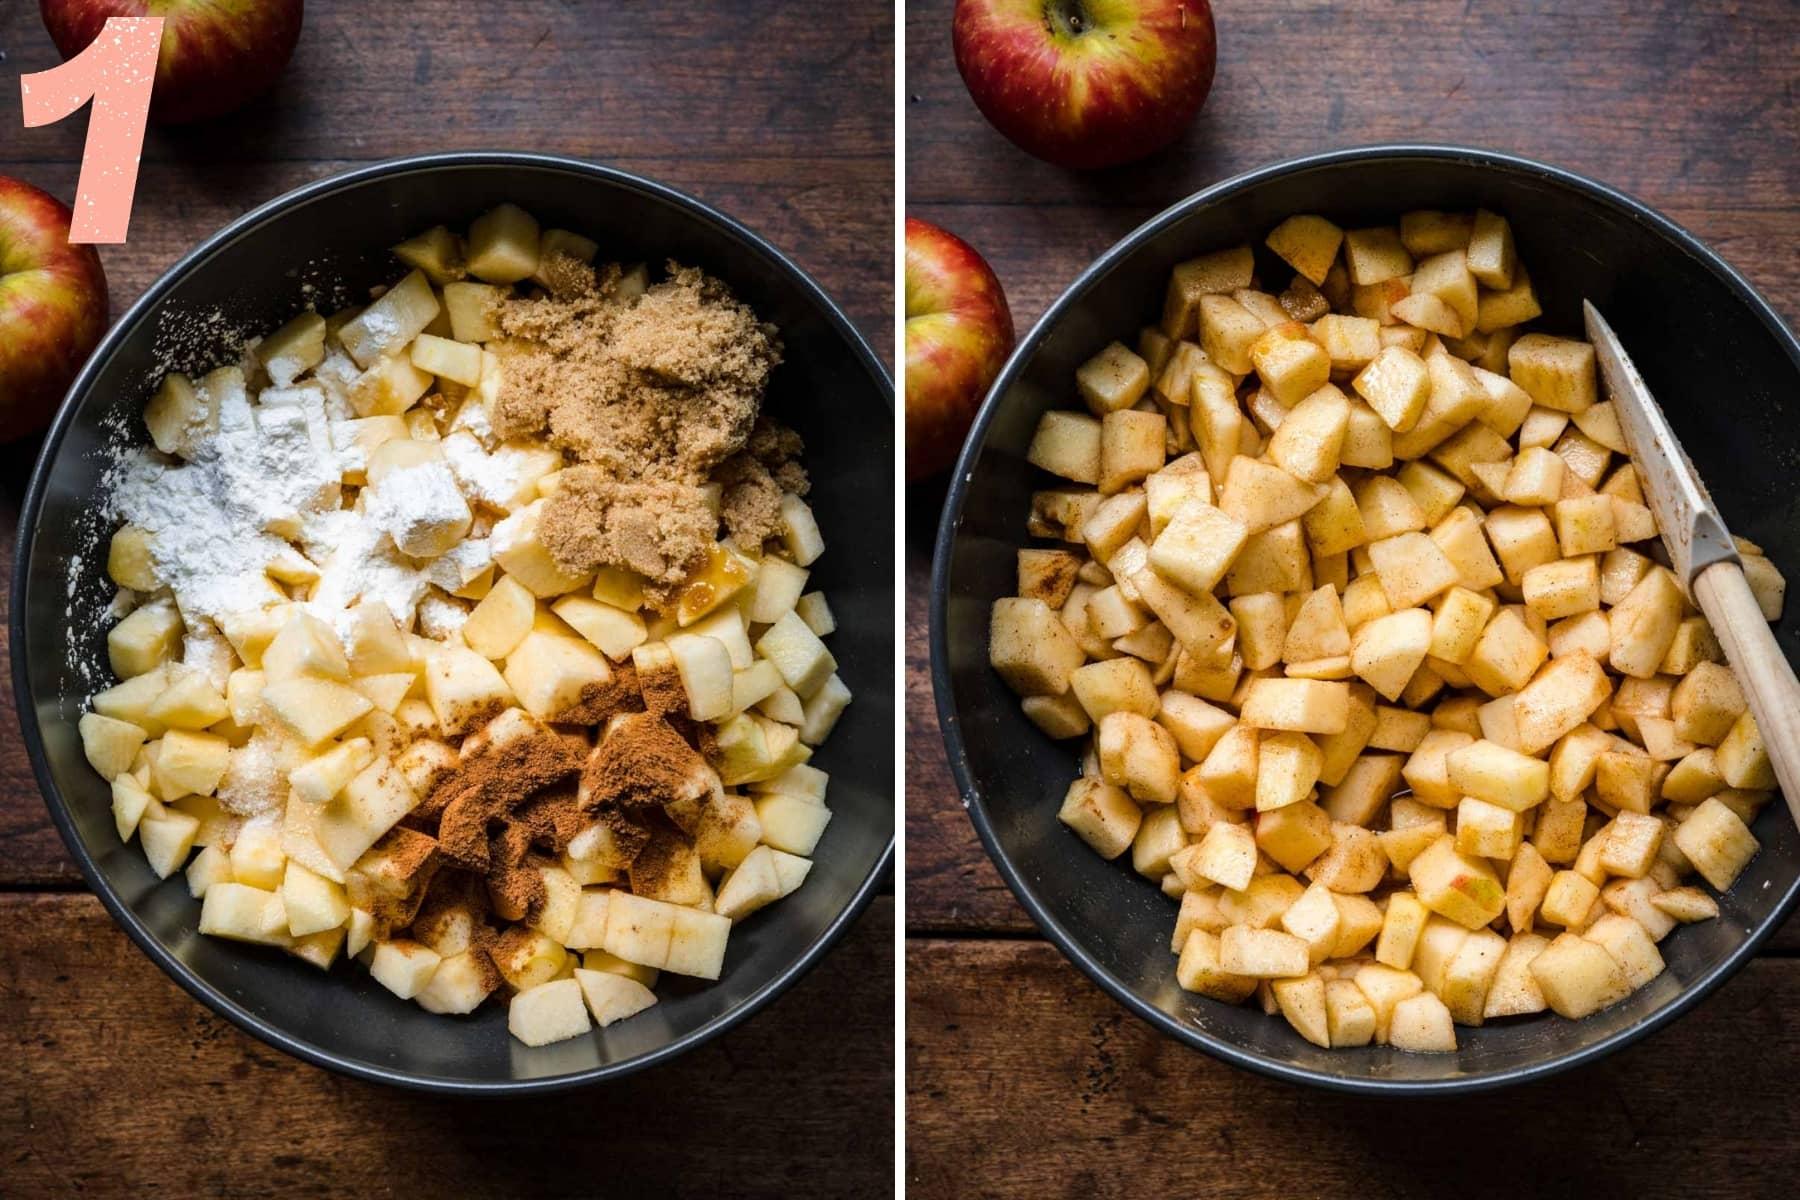 before and after stirring together ingredients for vegan apple crisp filling in black mixing bowl.